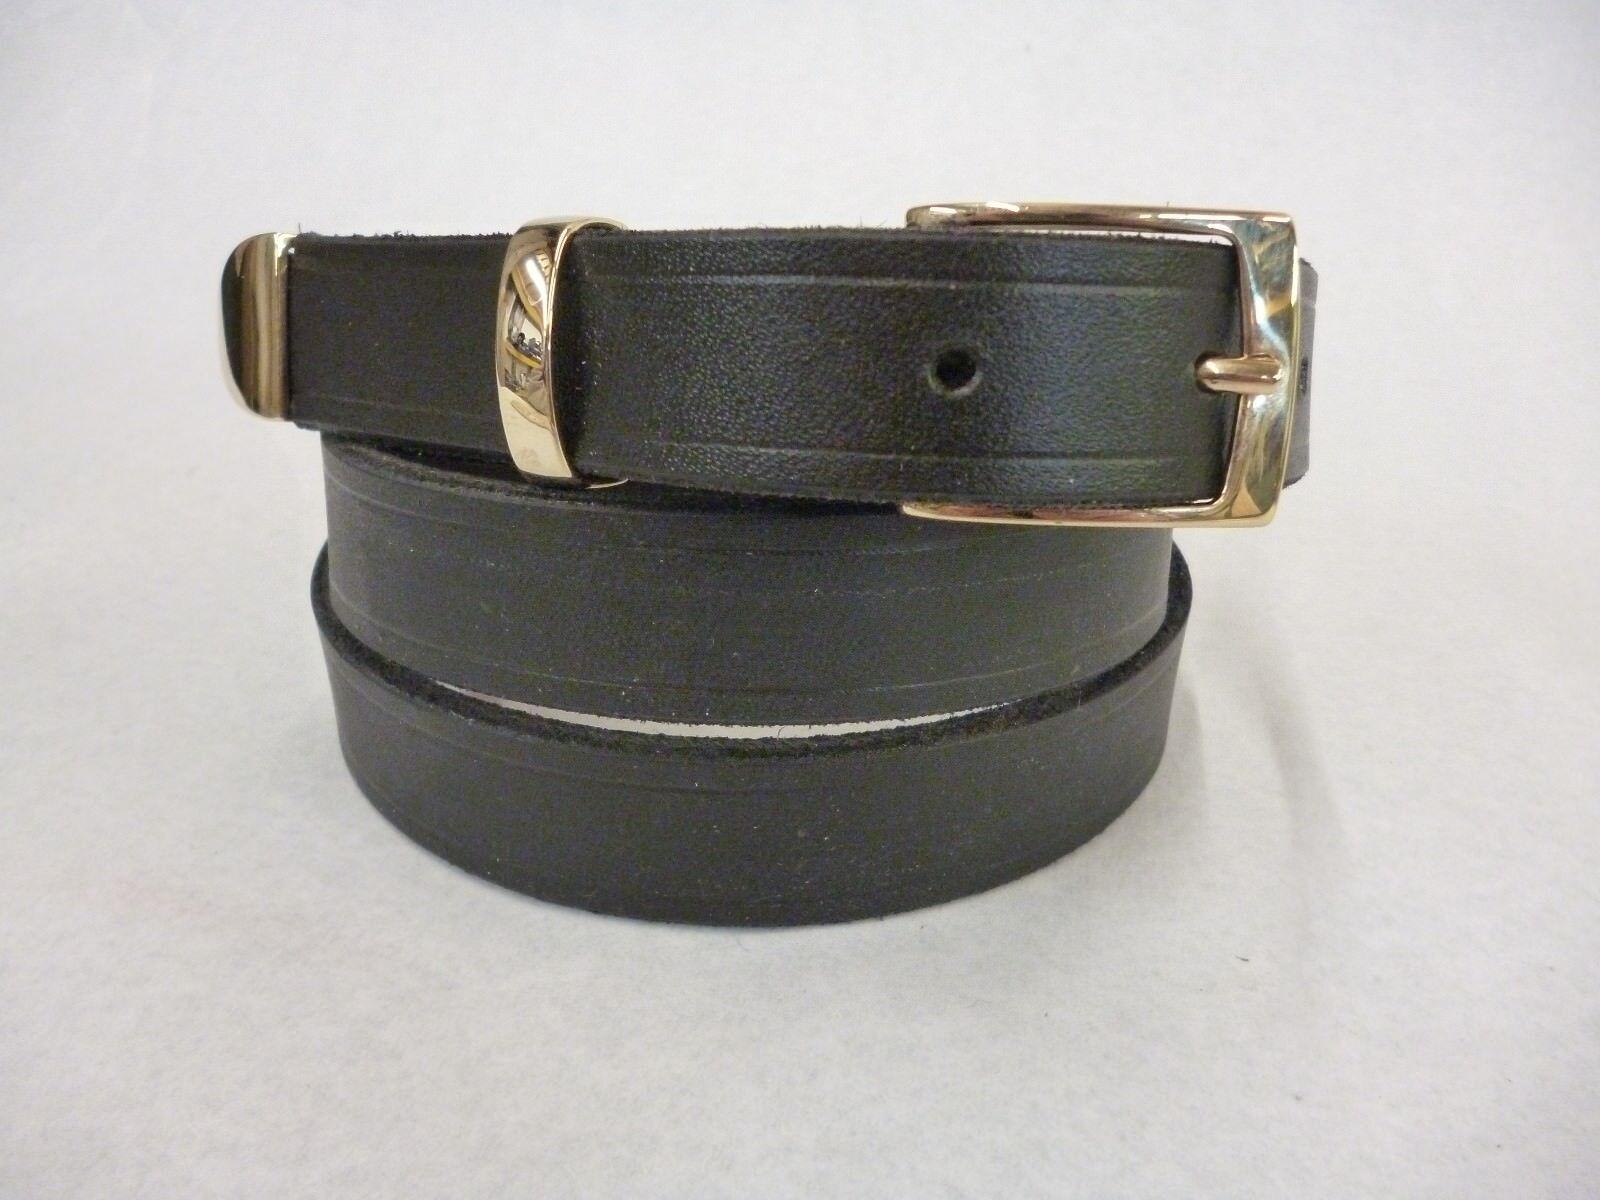 Black Real Bridle leather western Gold 3 Piece Tip Buckle Belt 25 mm Handmade t1